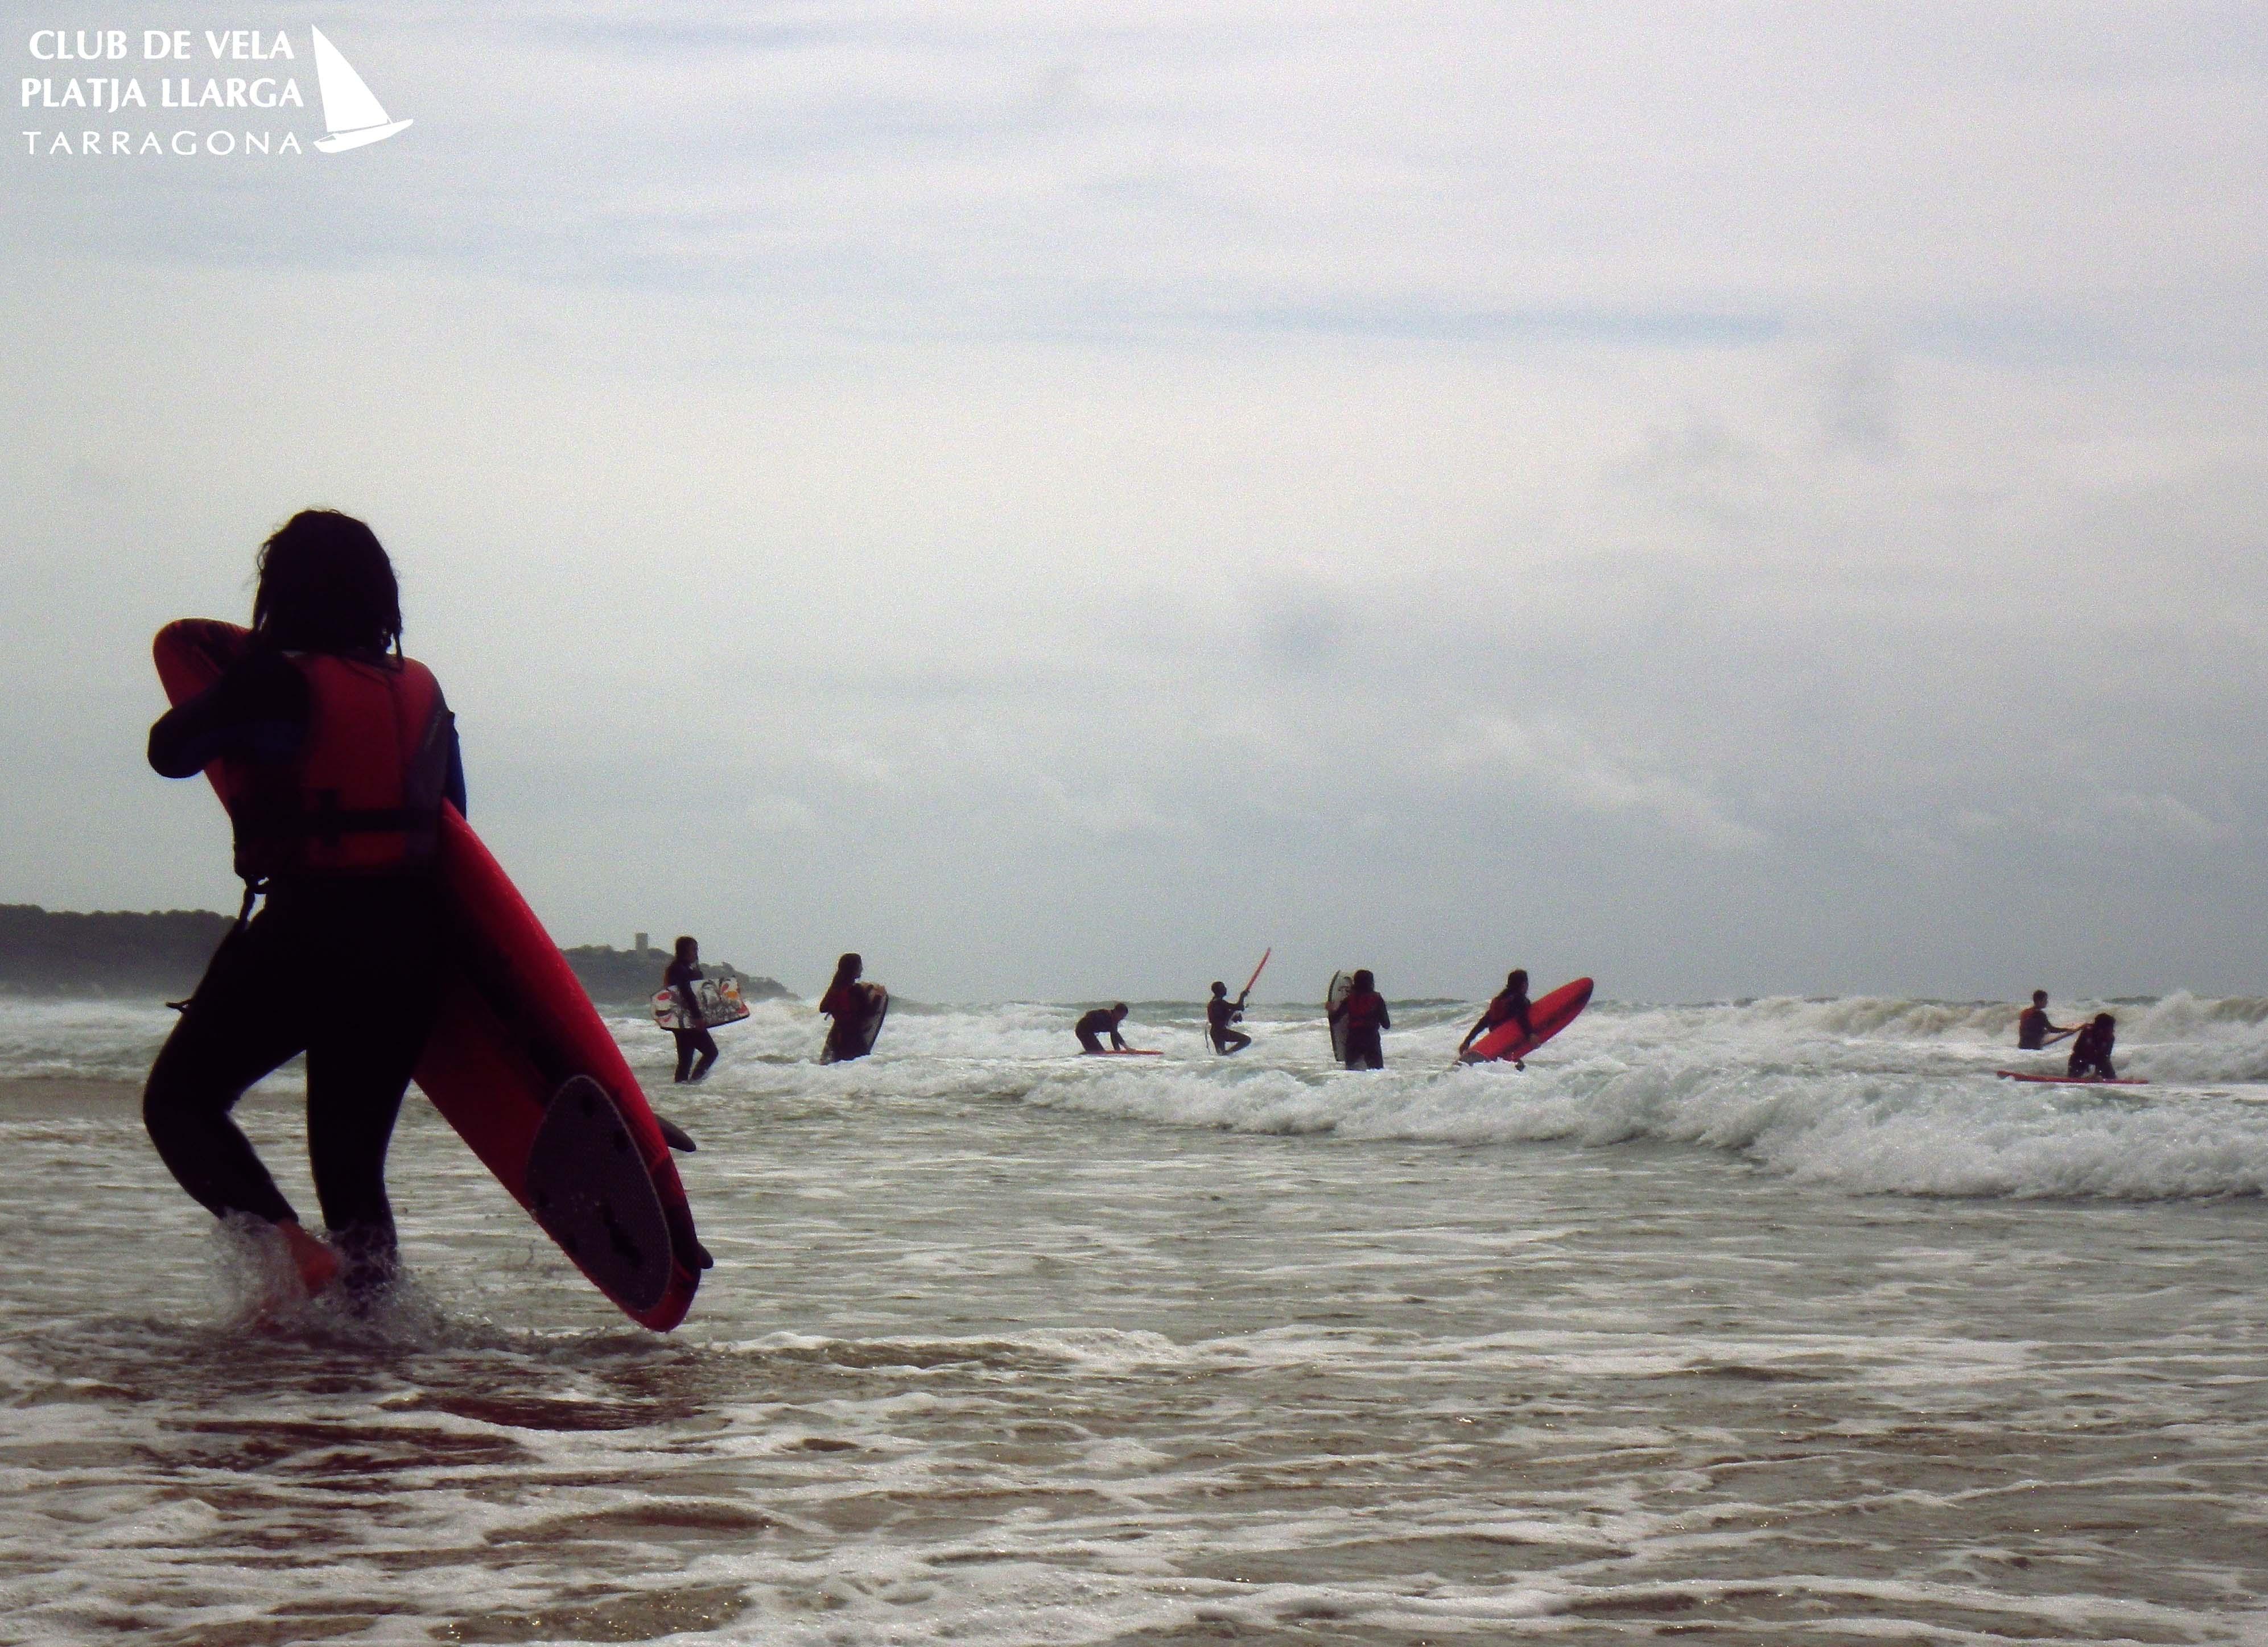 surf tarragona surfraiders